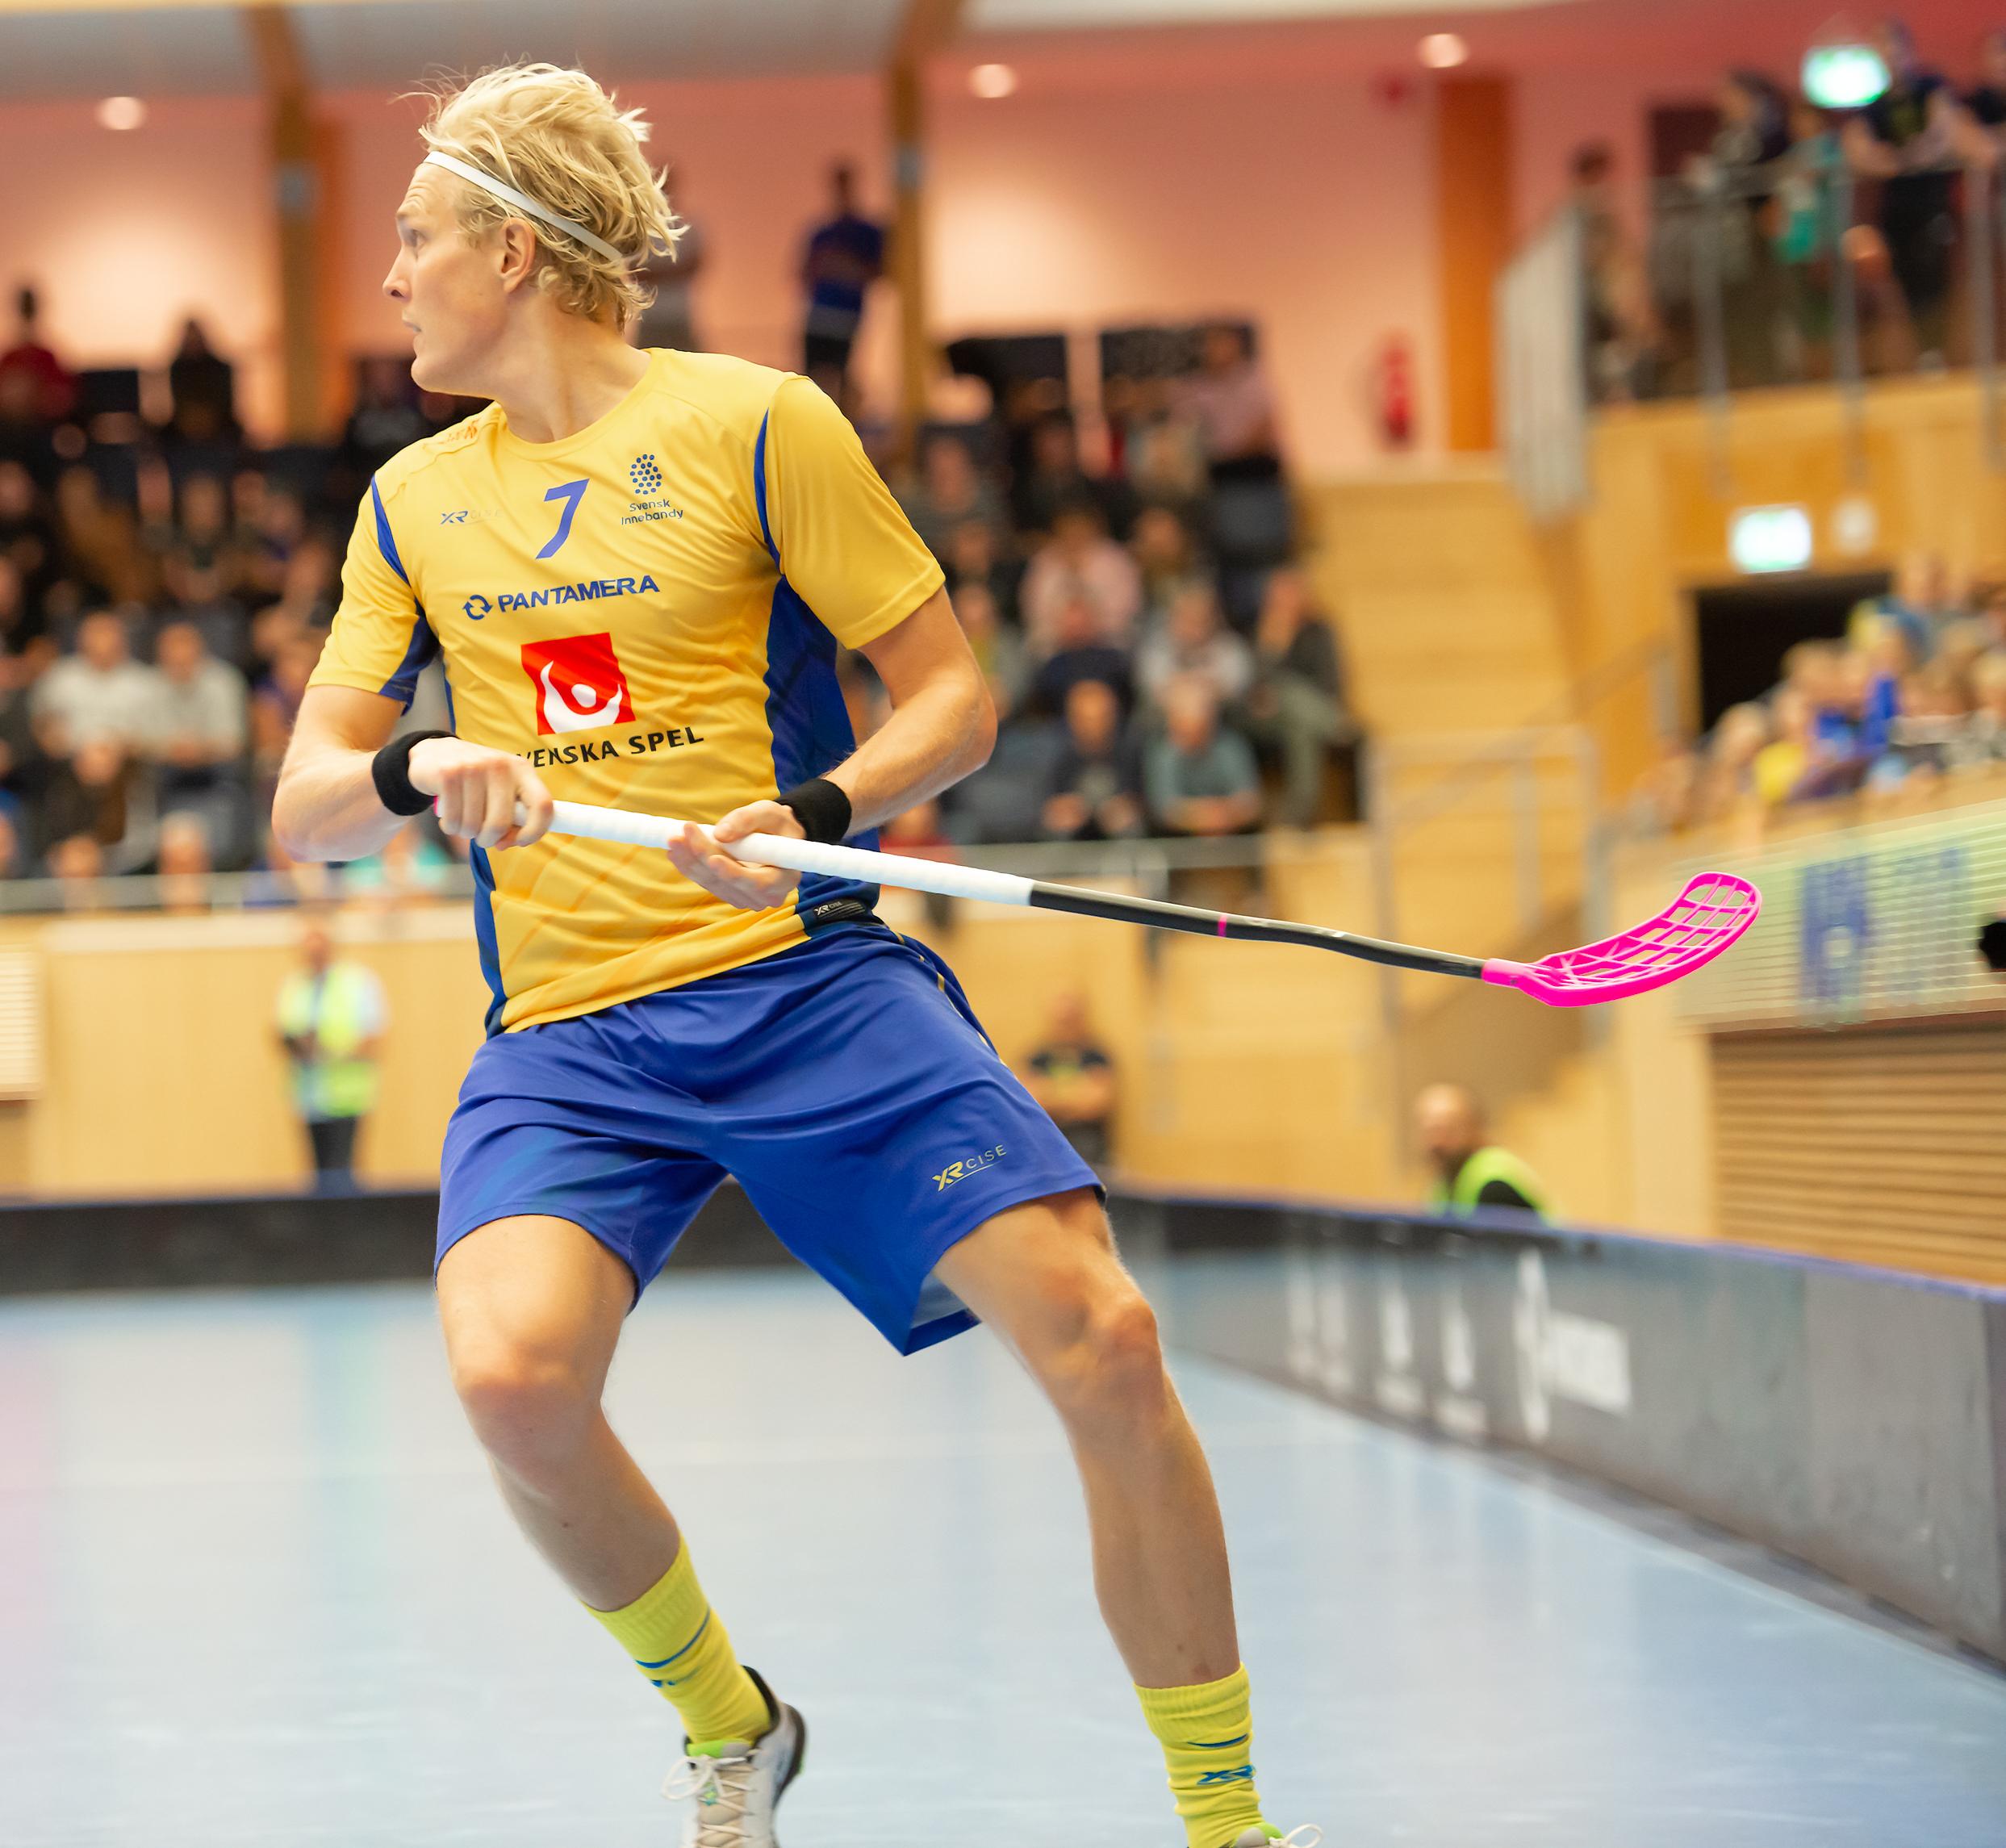 File:Kim Nilsson EFT Sweden 2018-10-21 87 jpg - Wikimedia